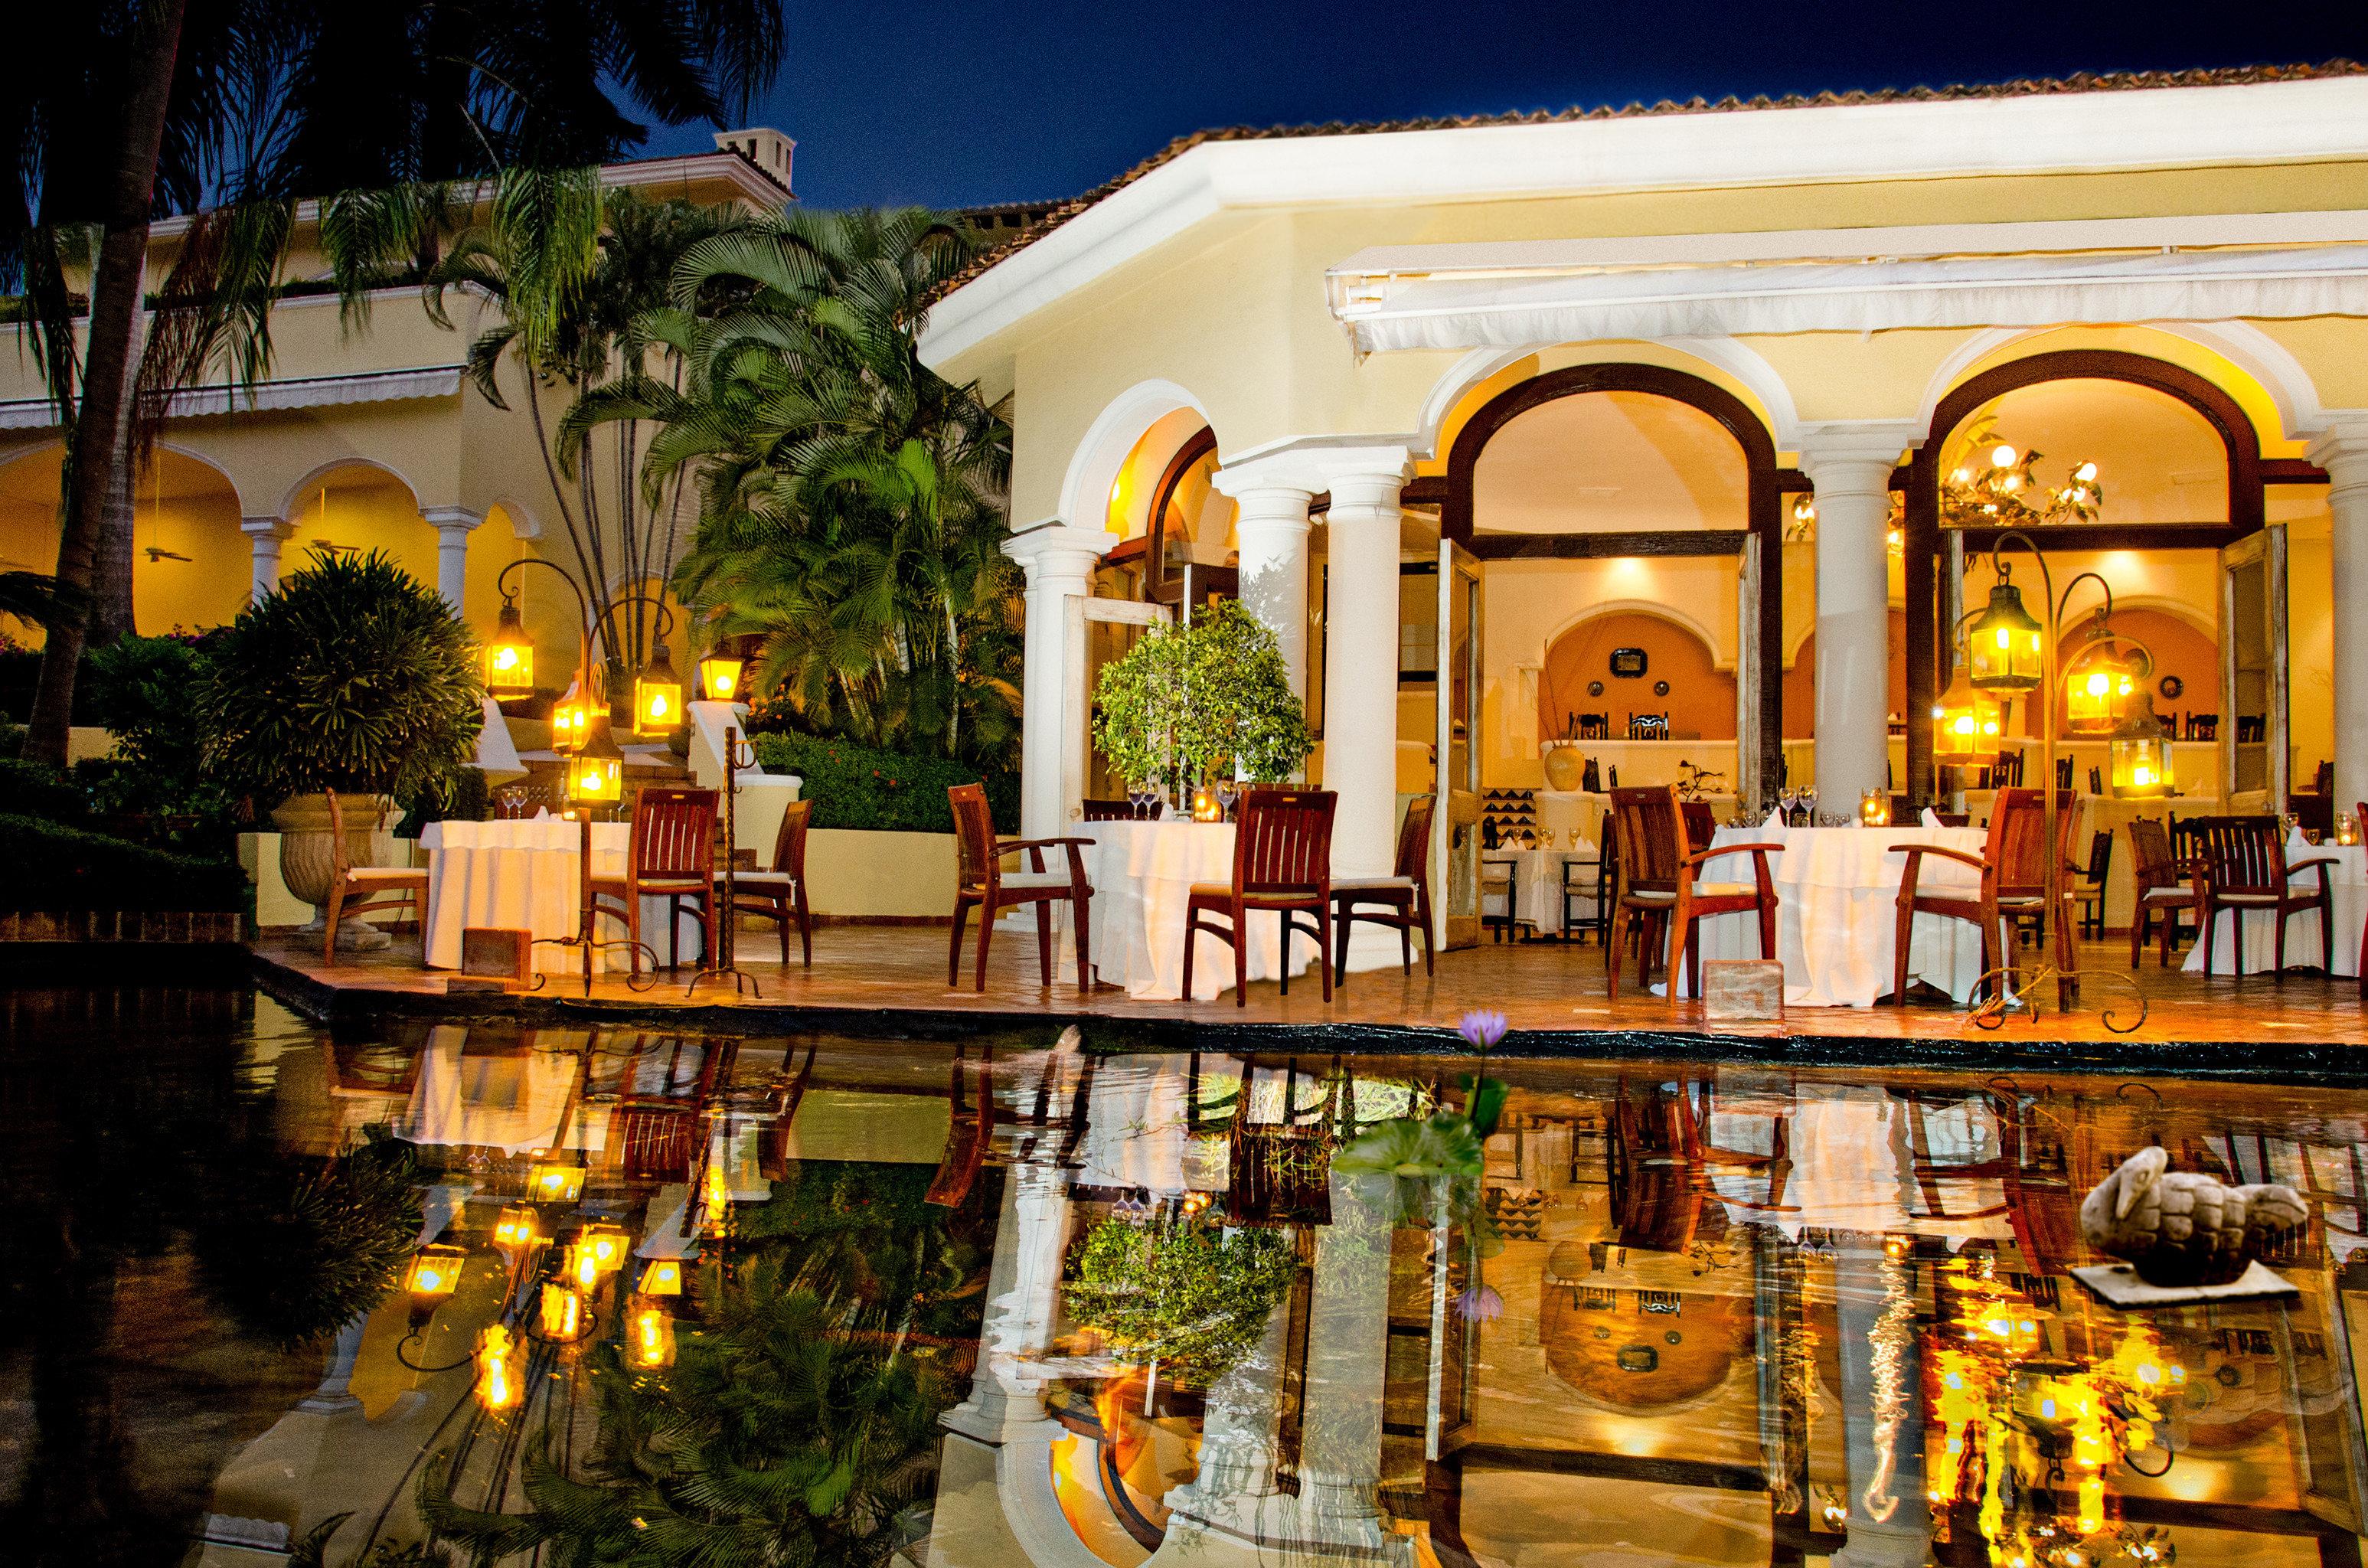 Elegant Lounge Luxury Modern Pool night restaurant plaza